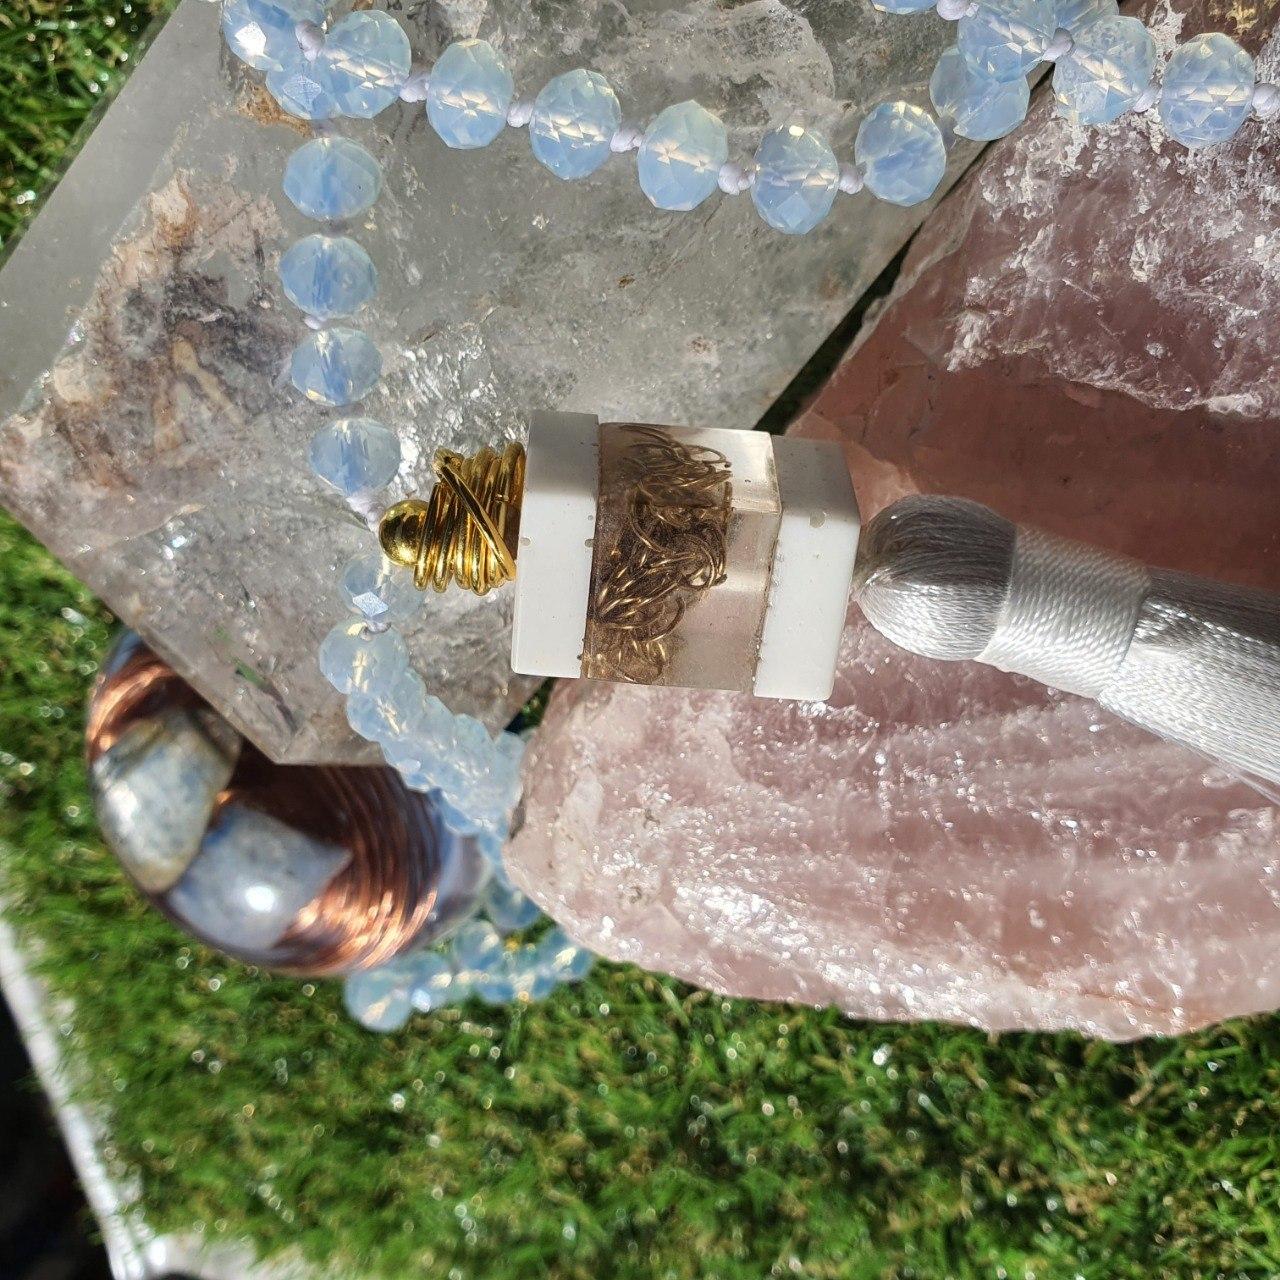 Japamala de Cristal com Orgonite - Branco Neve